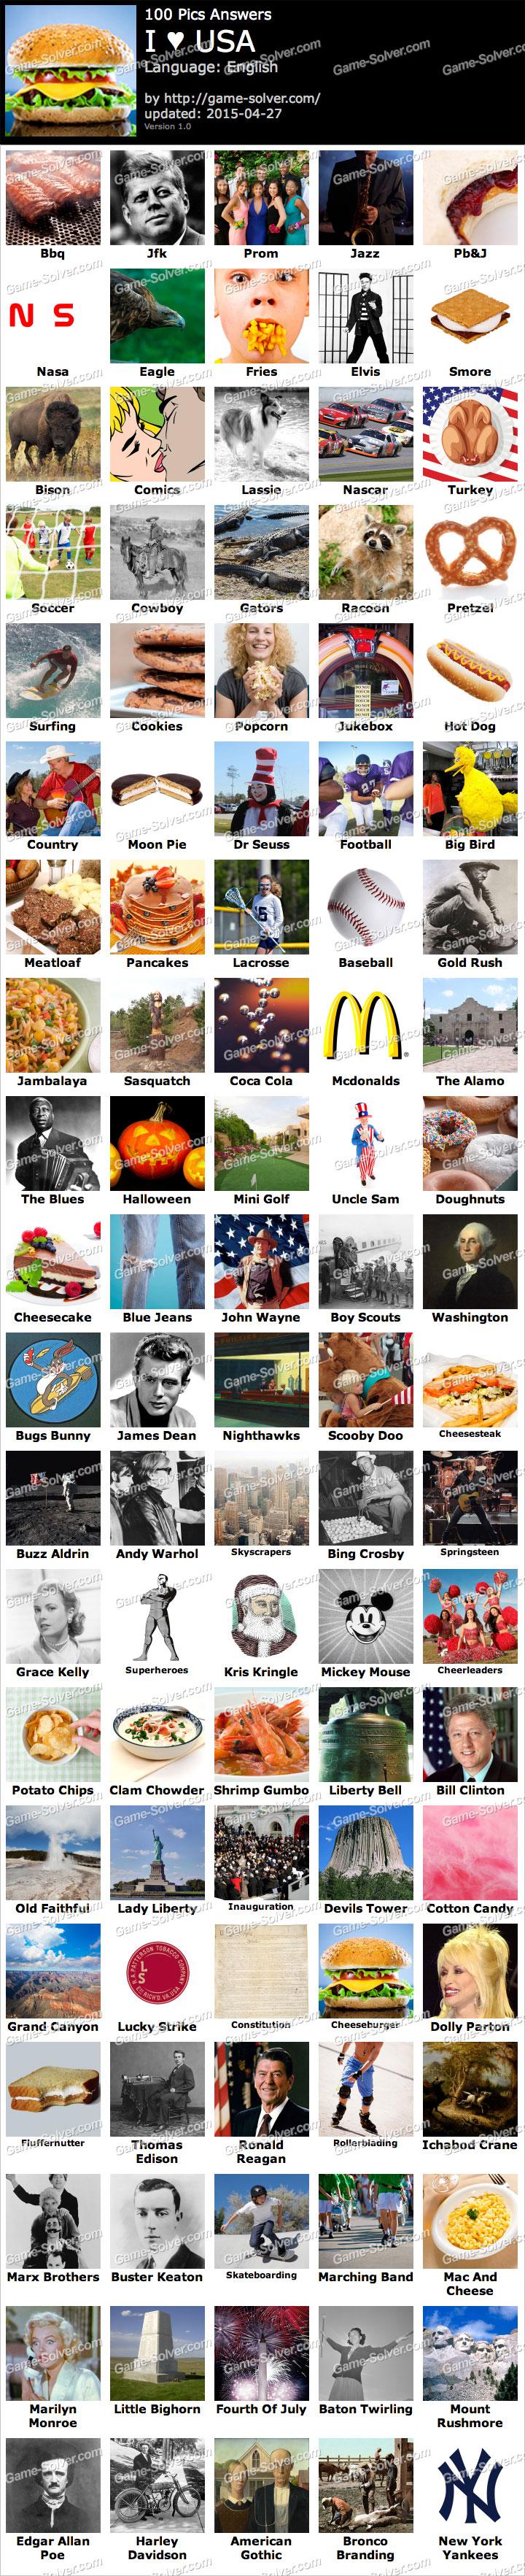 100 Pics Answers i Love 2000s 100 Pics i Love Usa